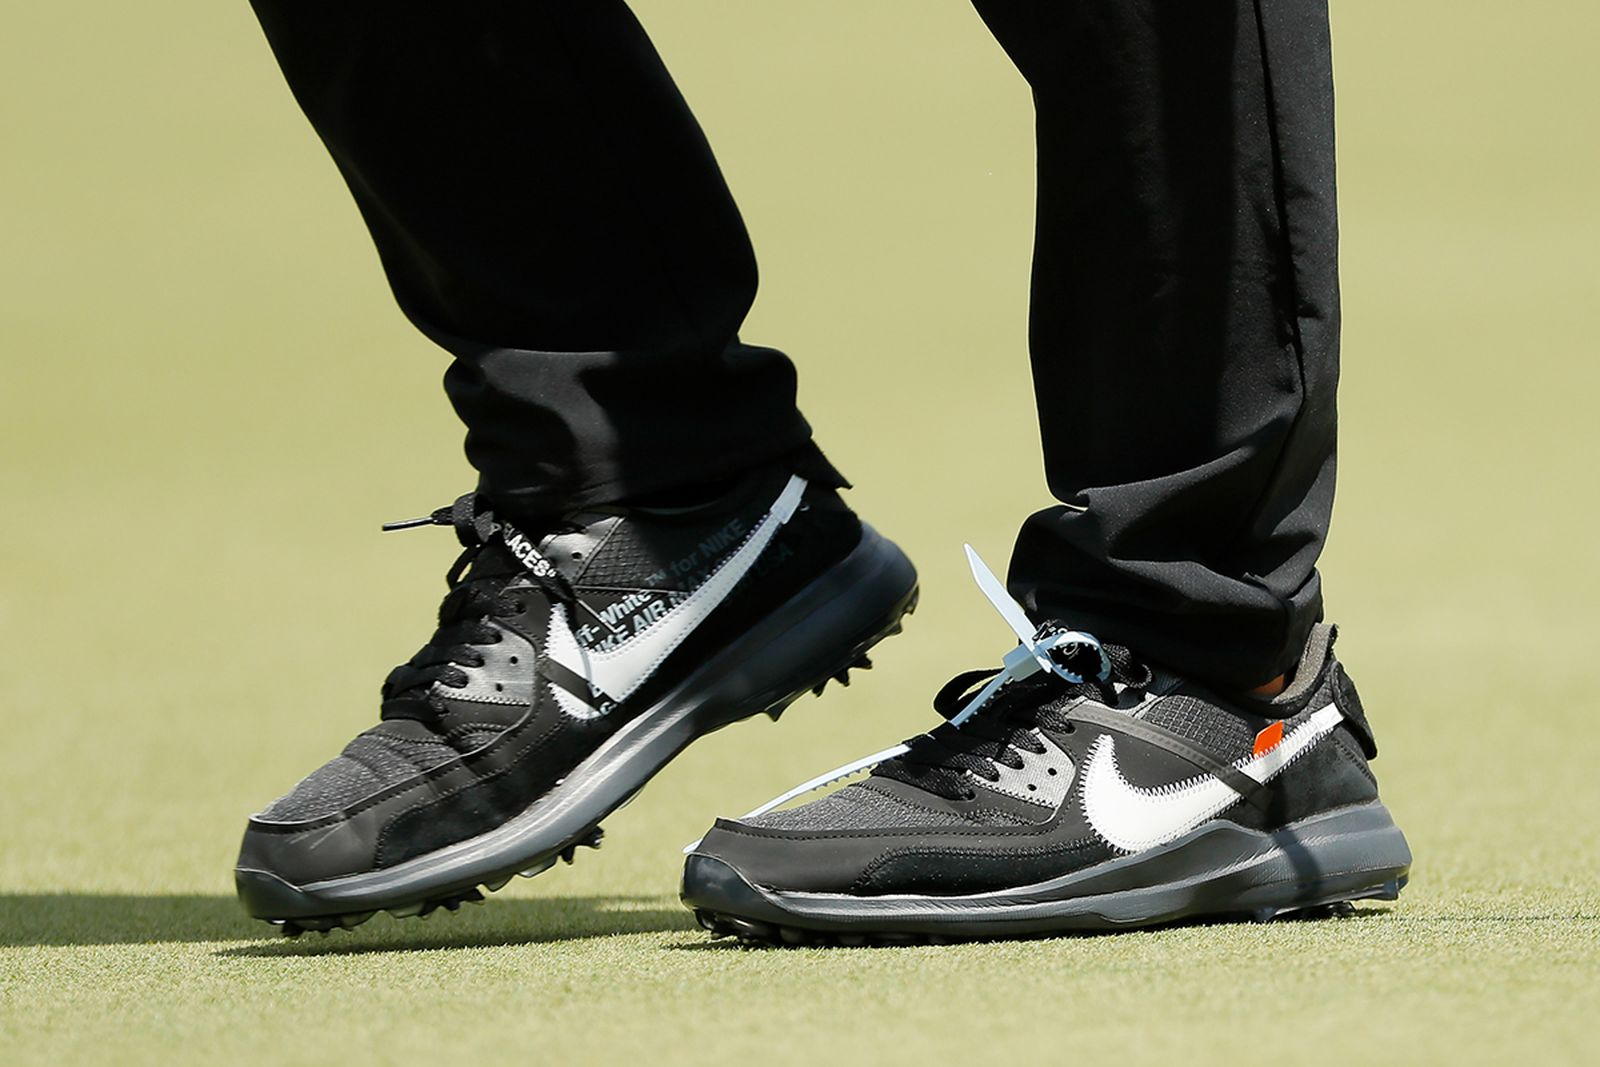 Brooks Koepka Off-White Nike golf shoes